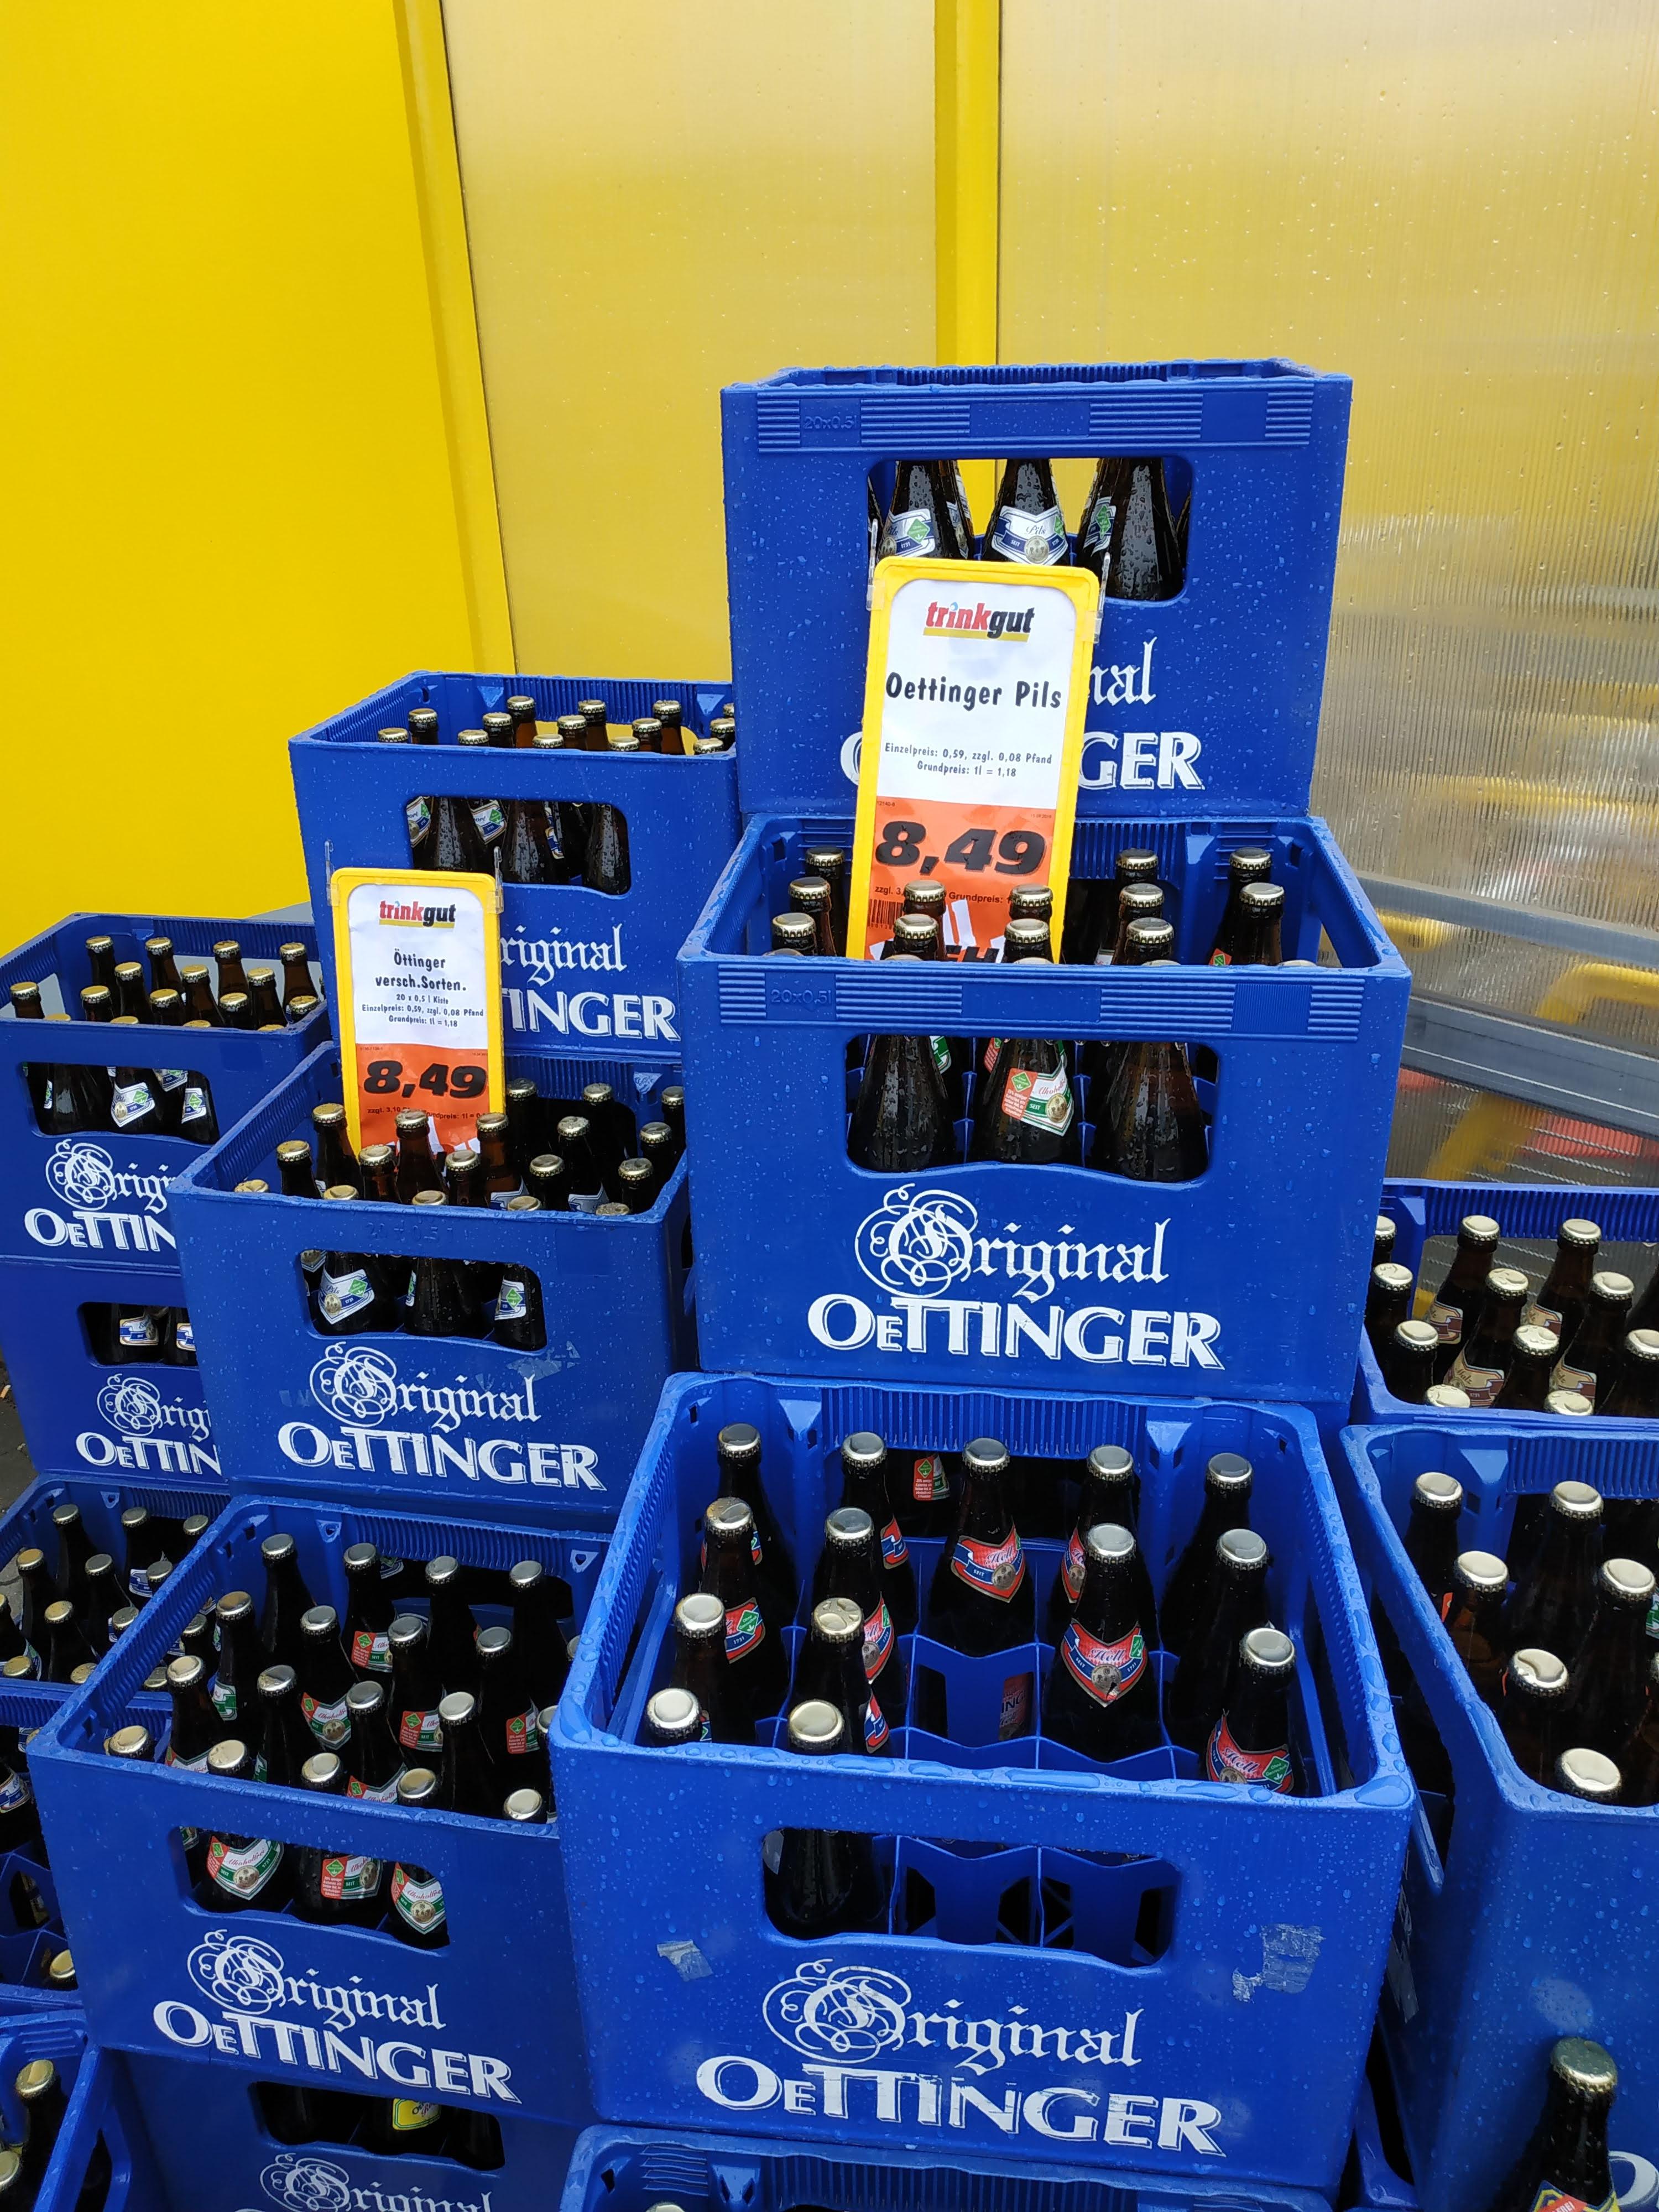 [LOKAL] Trinkgut Bonn Beuel mach jetzt in Wintersport: Oettinger Pils 20x0,5 für 8,49